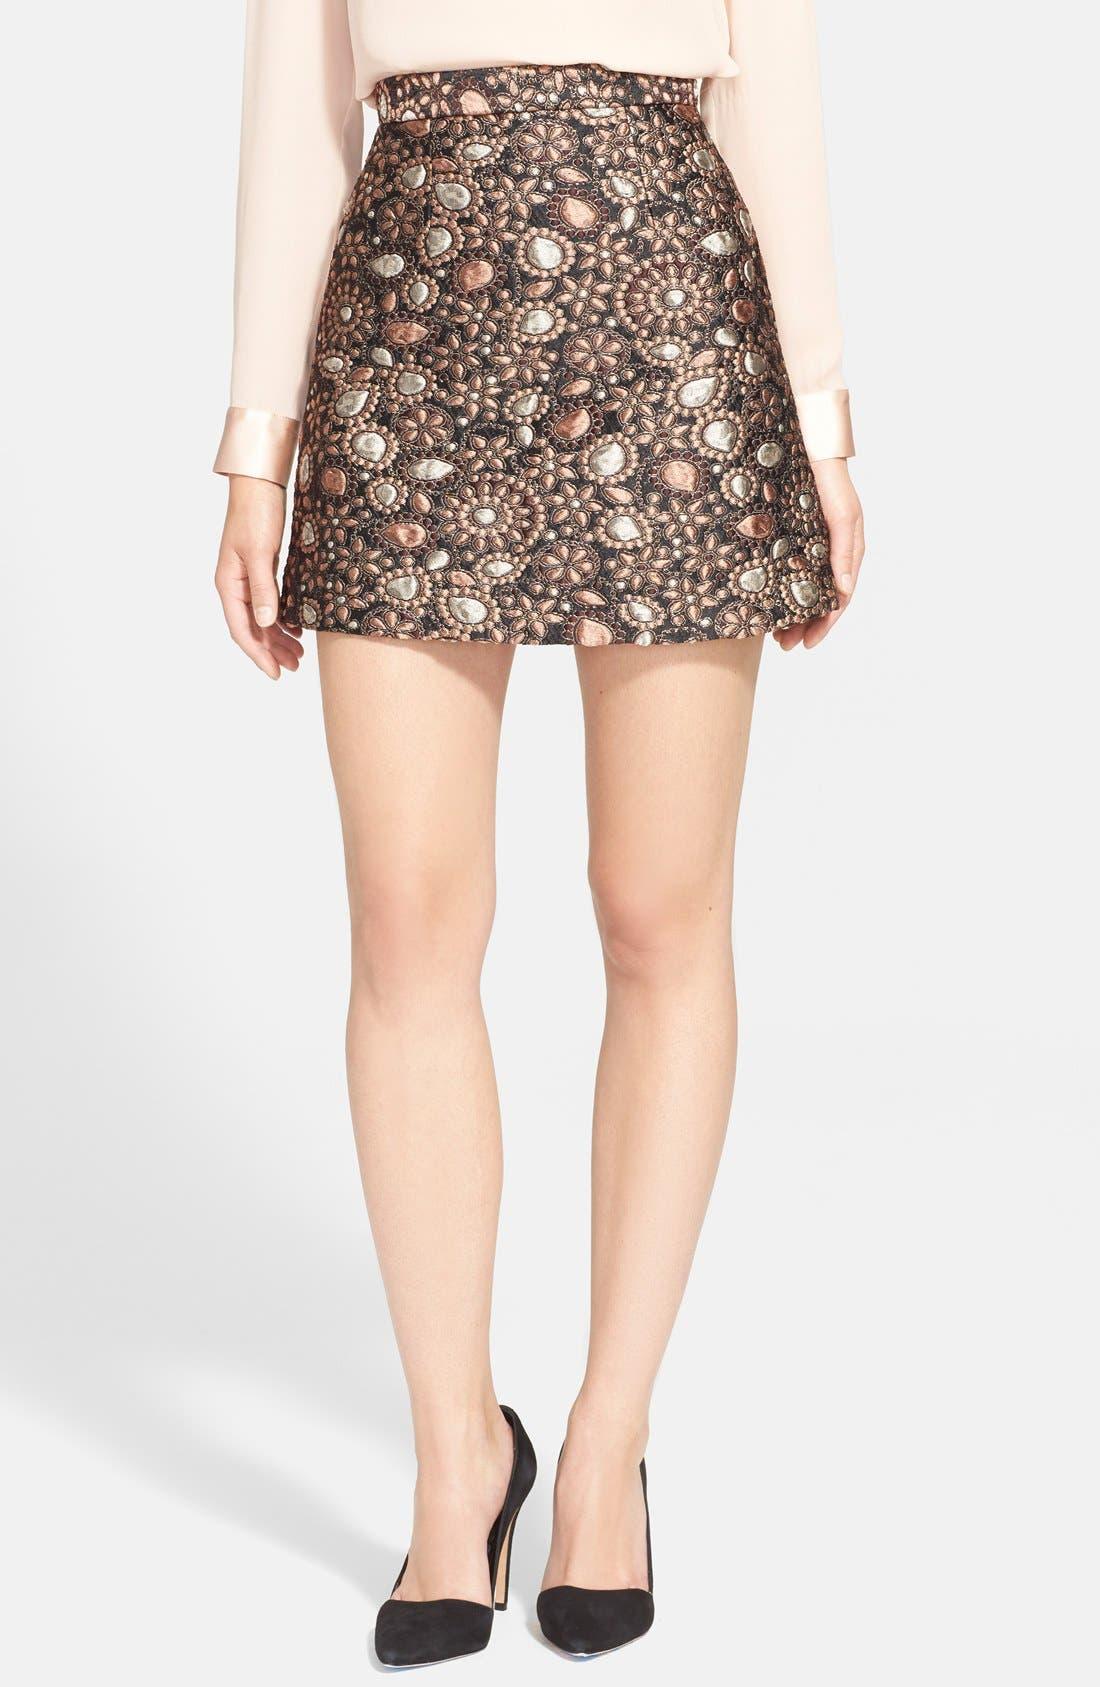 ALICE + OLIVIA, 'Jessa' A-Line Skirt, Main thumbnail 1, color, 716